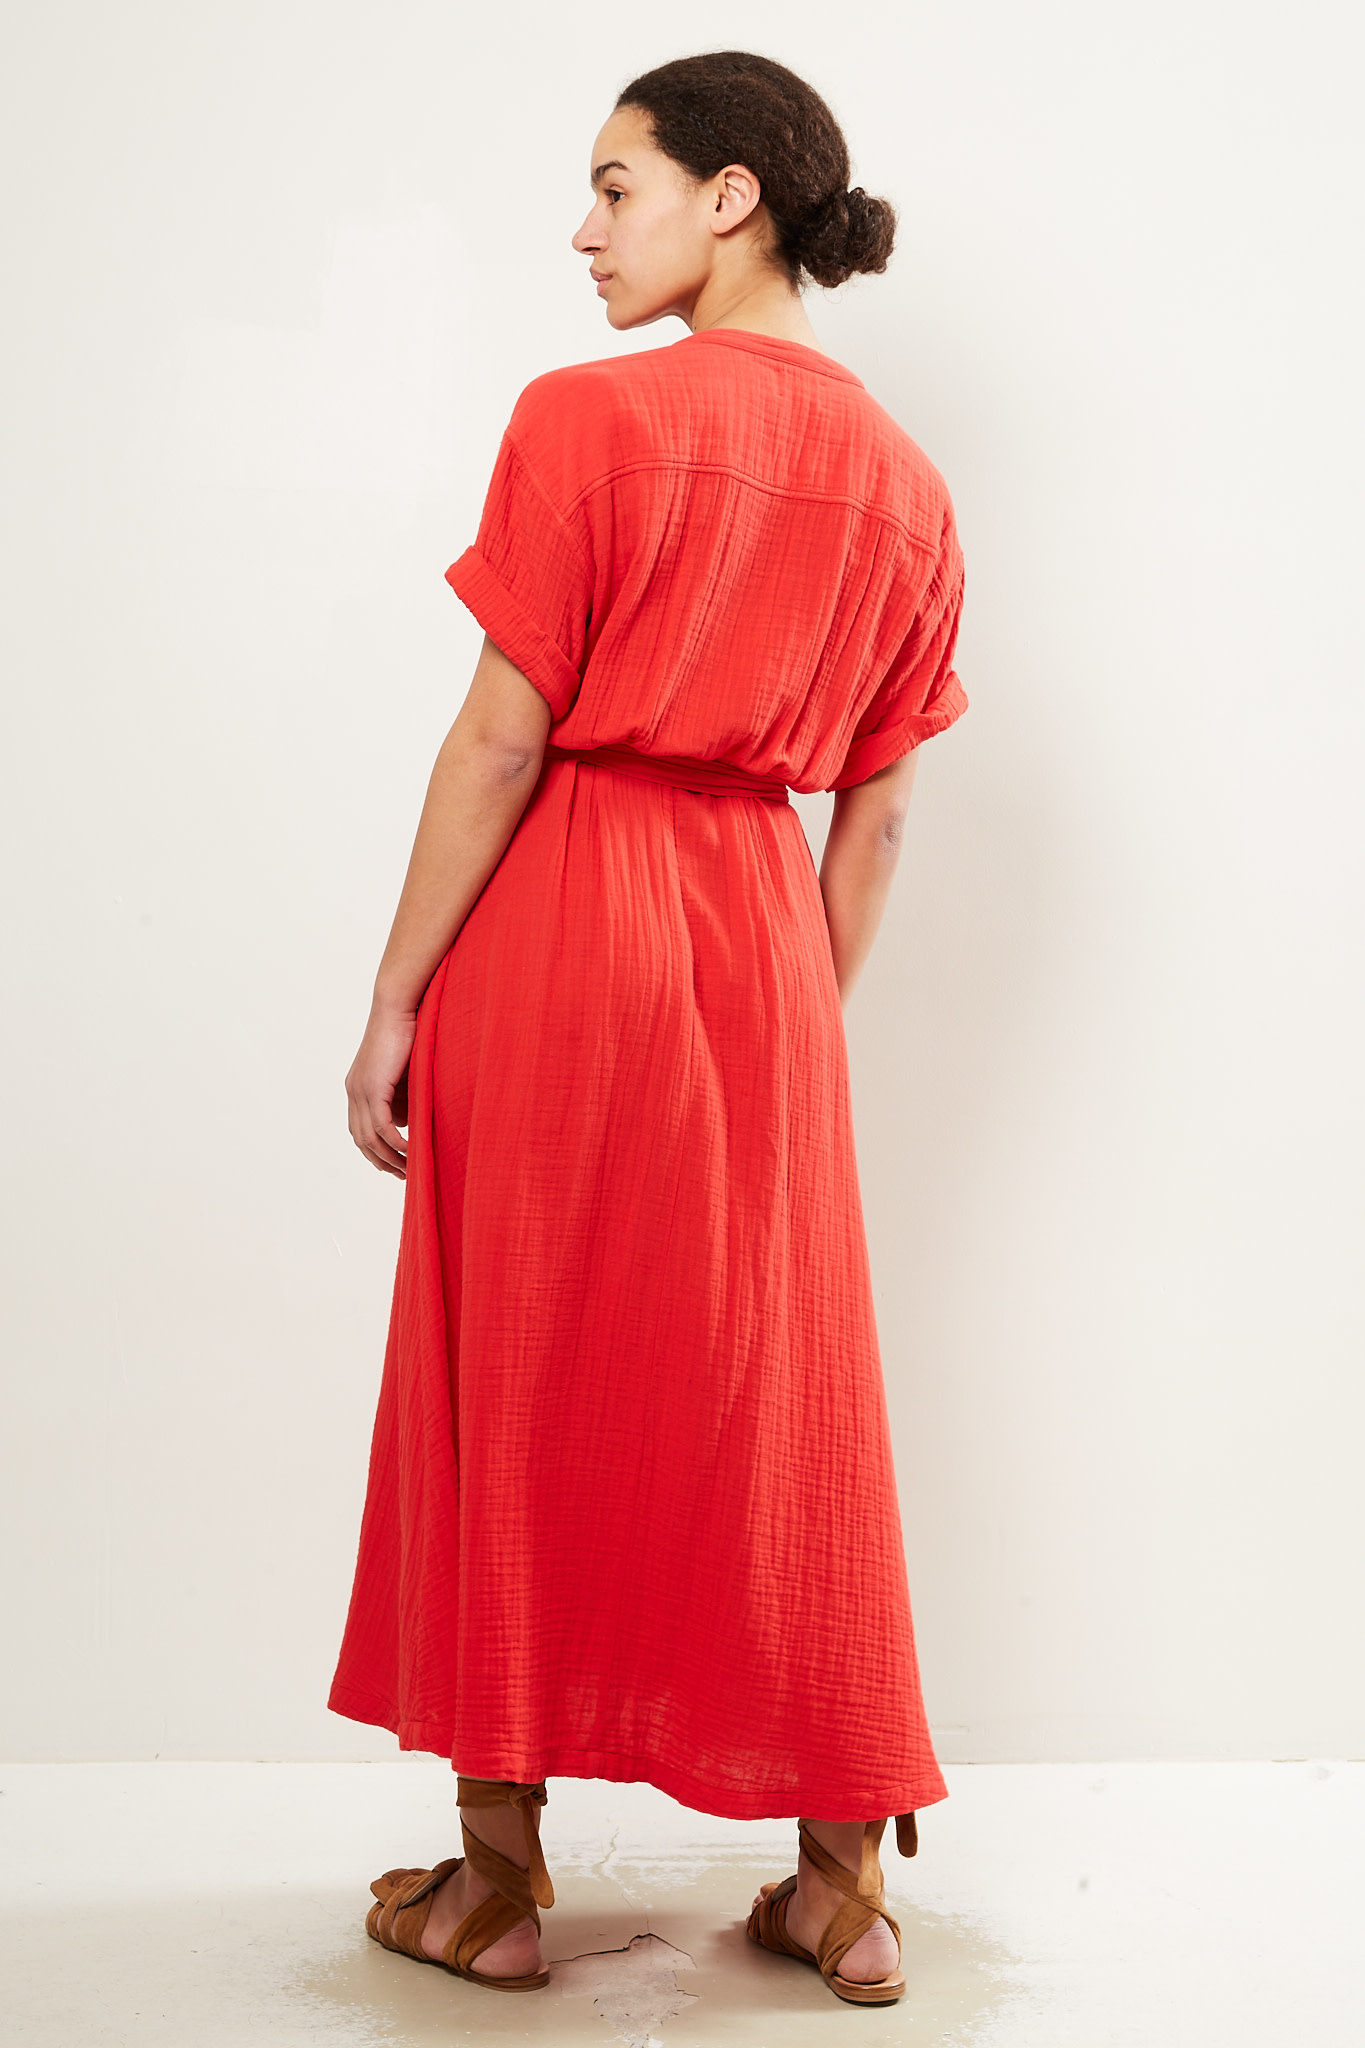 Xirena - Cate chelsea dress